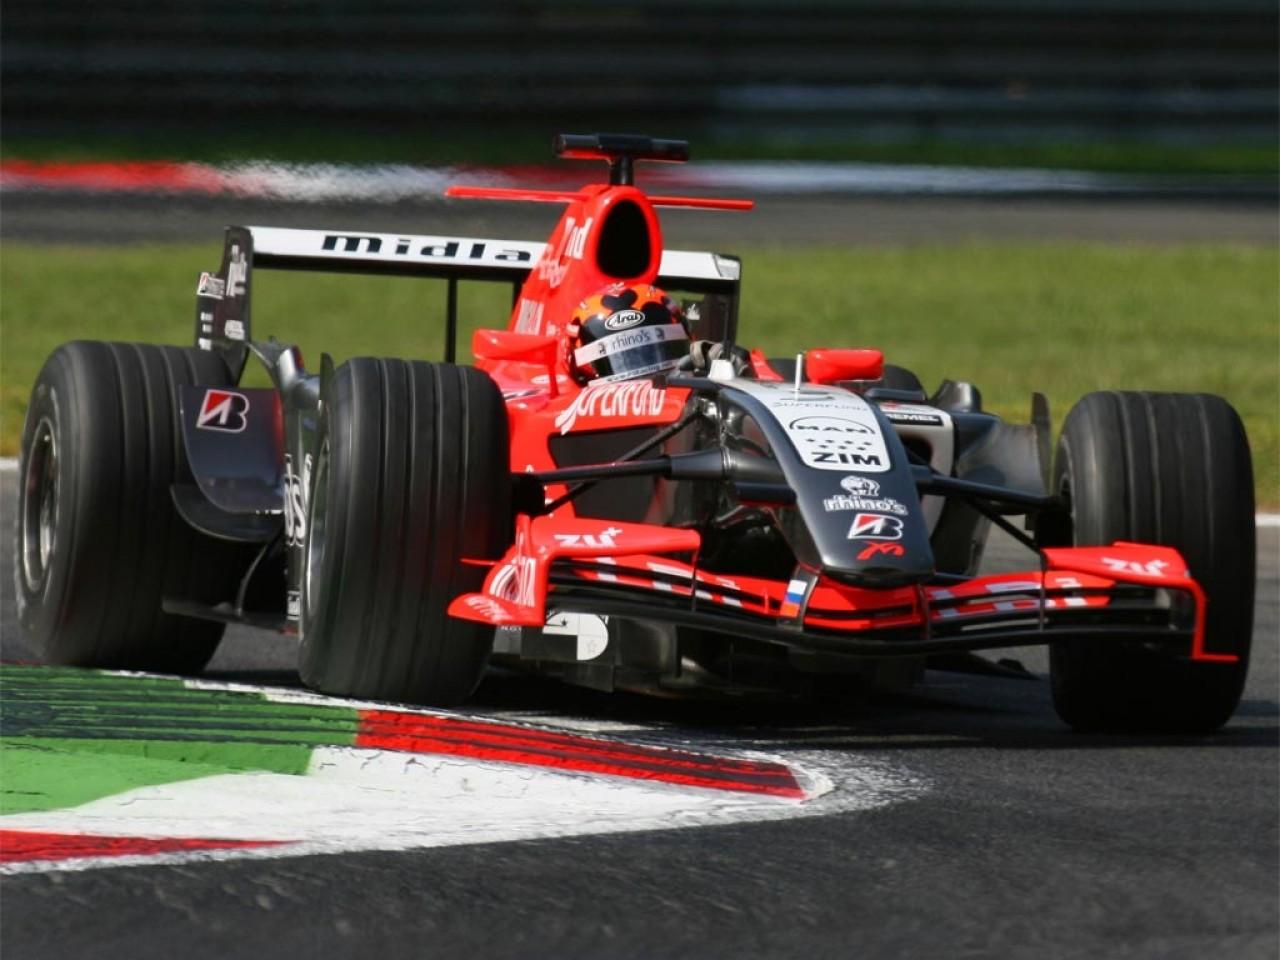 Hungarian Grand Prix 2019